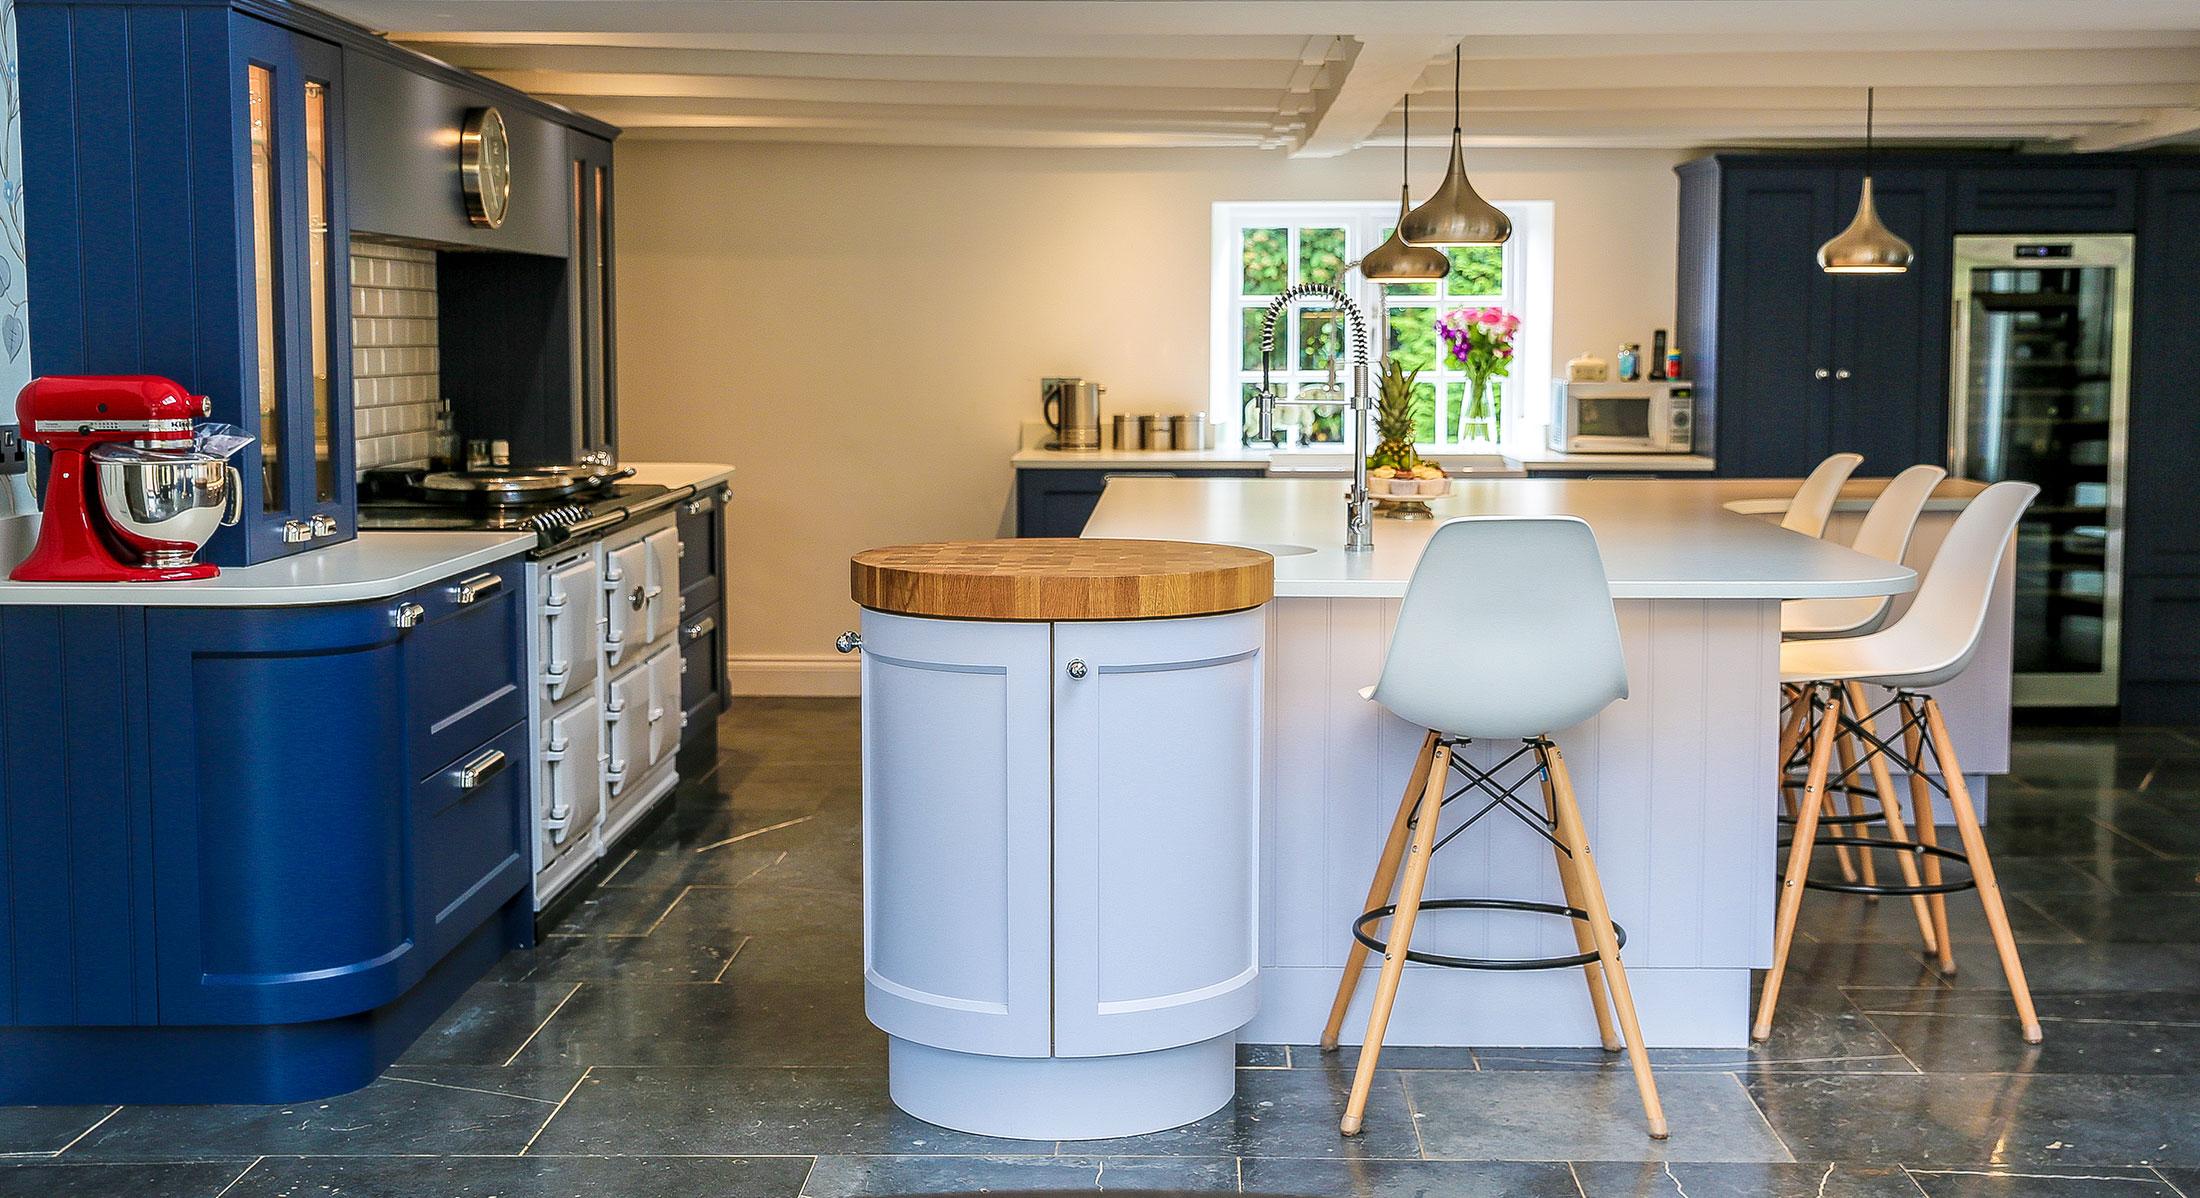 charles-yorke-porto-kitchen-design-somerset-1